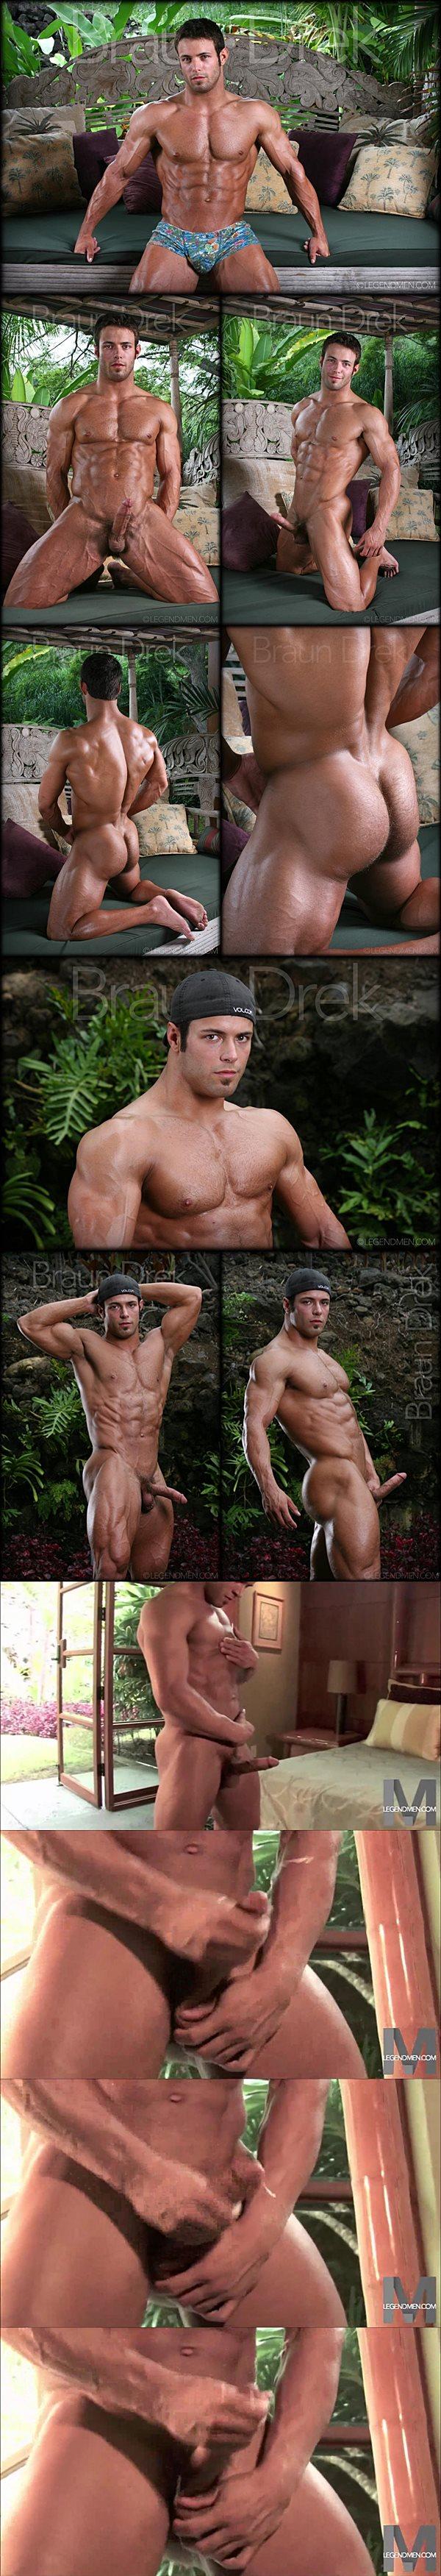 Sexy muscle hunk Braun Drek shoots 12 big cumshots in a row at Legendmen